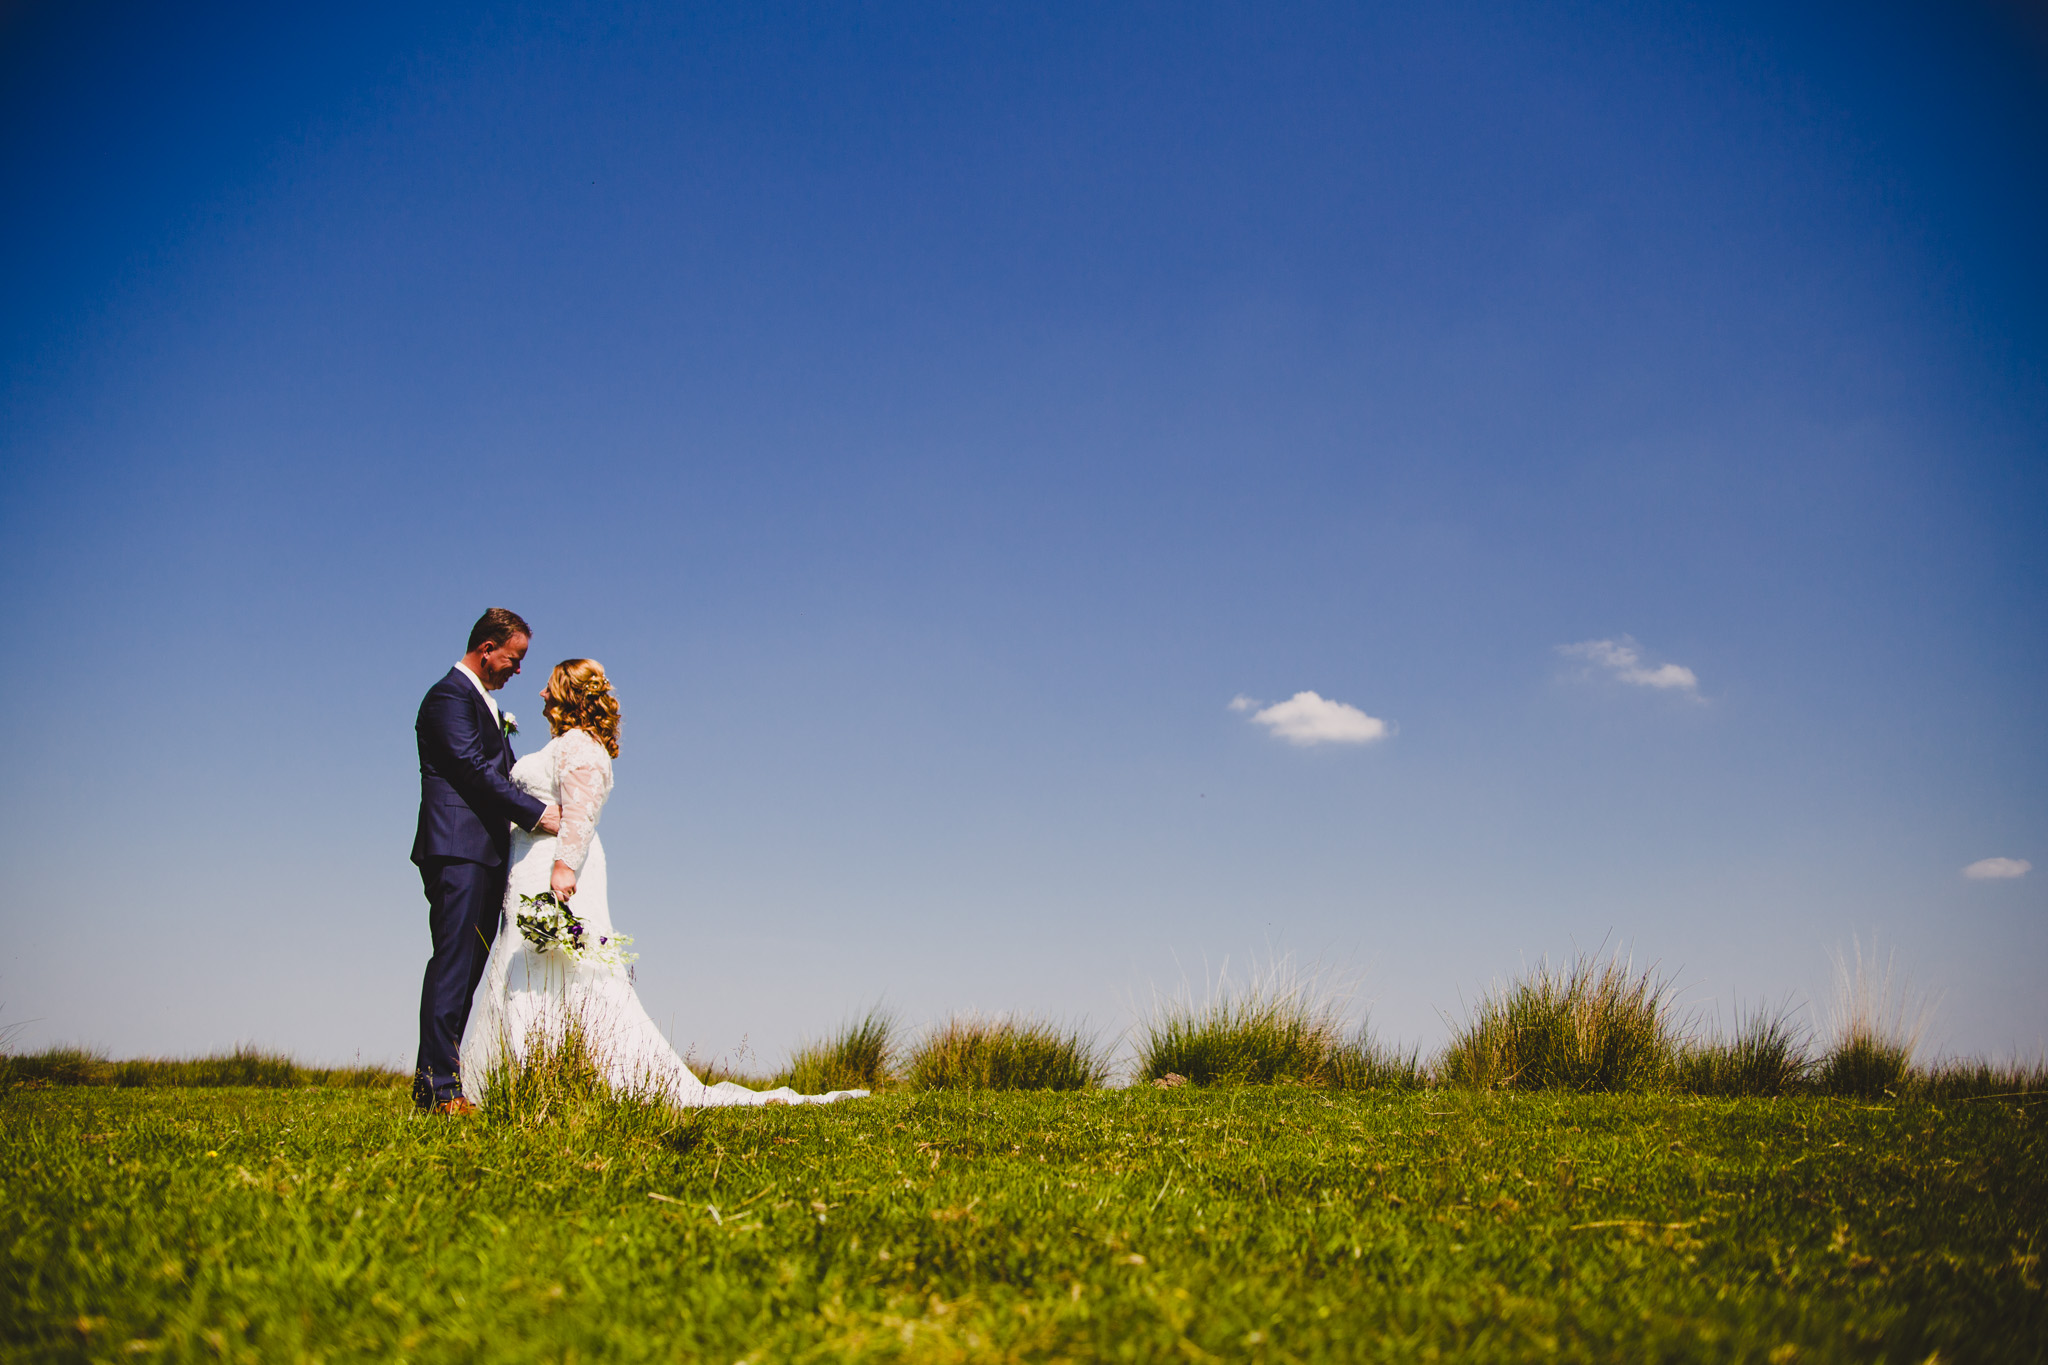 fotograaf veendam trouwfotografie bruid bruidegom